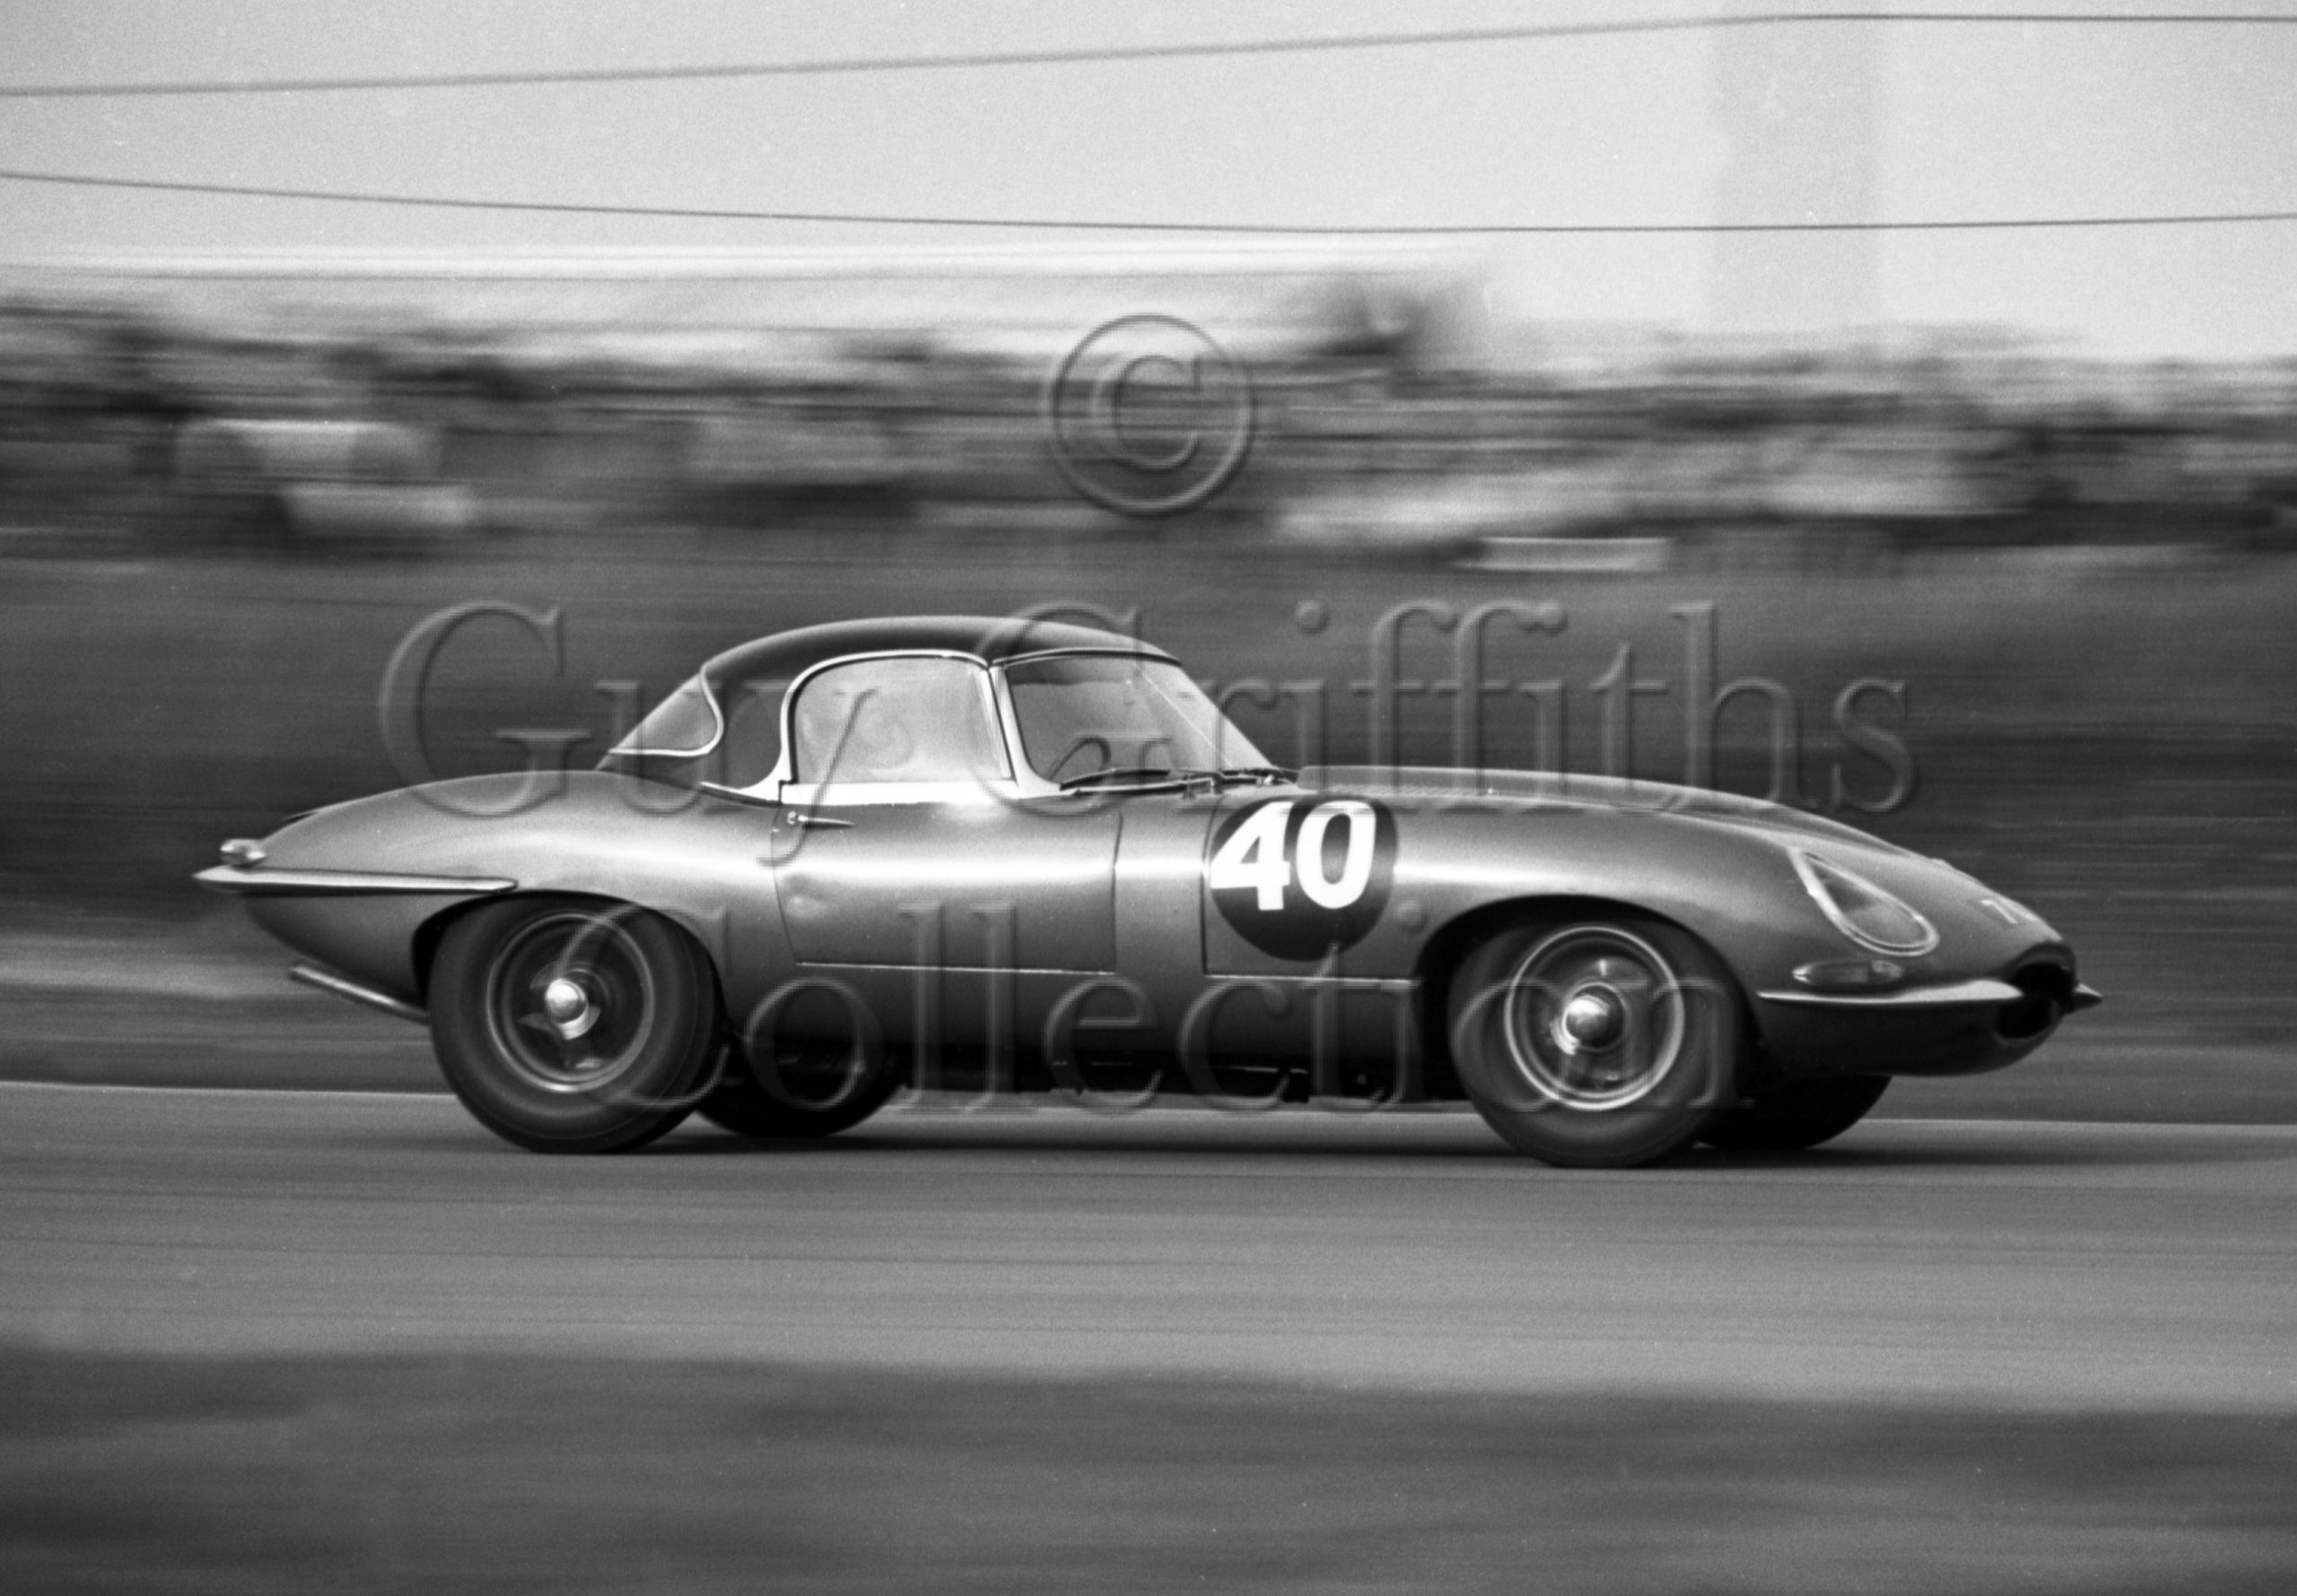 74-521–K-Baker–Jaguar-E-Type-7-CXW–Brands-Hatch–26-12-1962.jpg - Guy Griffiths Collection